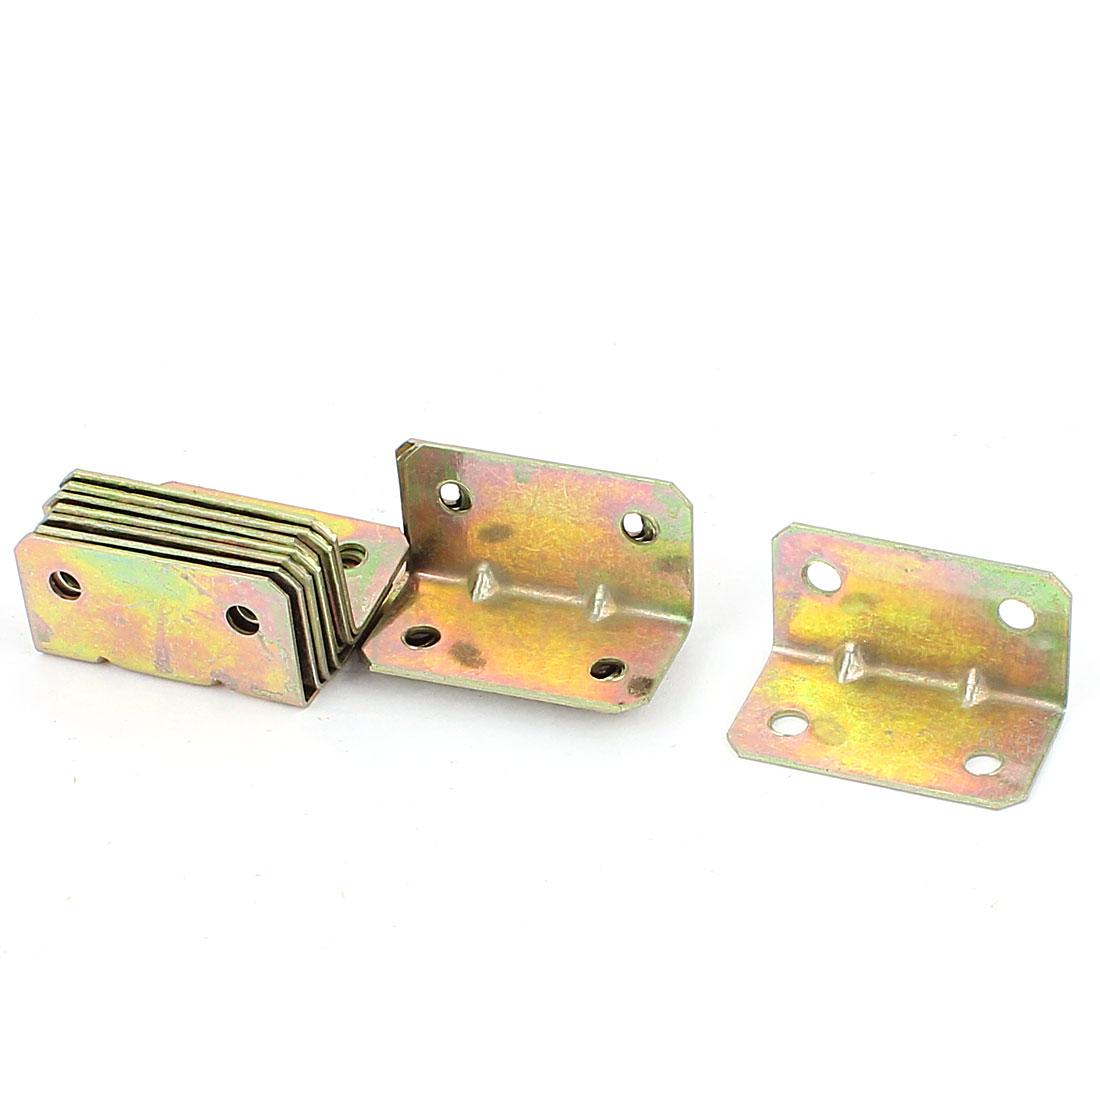 Brass Tone 38x21x20mm 90 Degree Corner Brace Repair Angle Bracket Shelf Support 12 Pcs